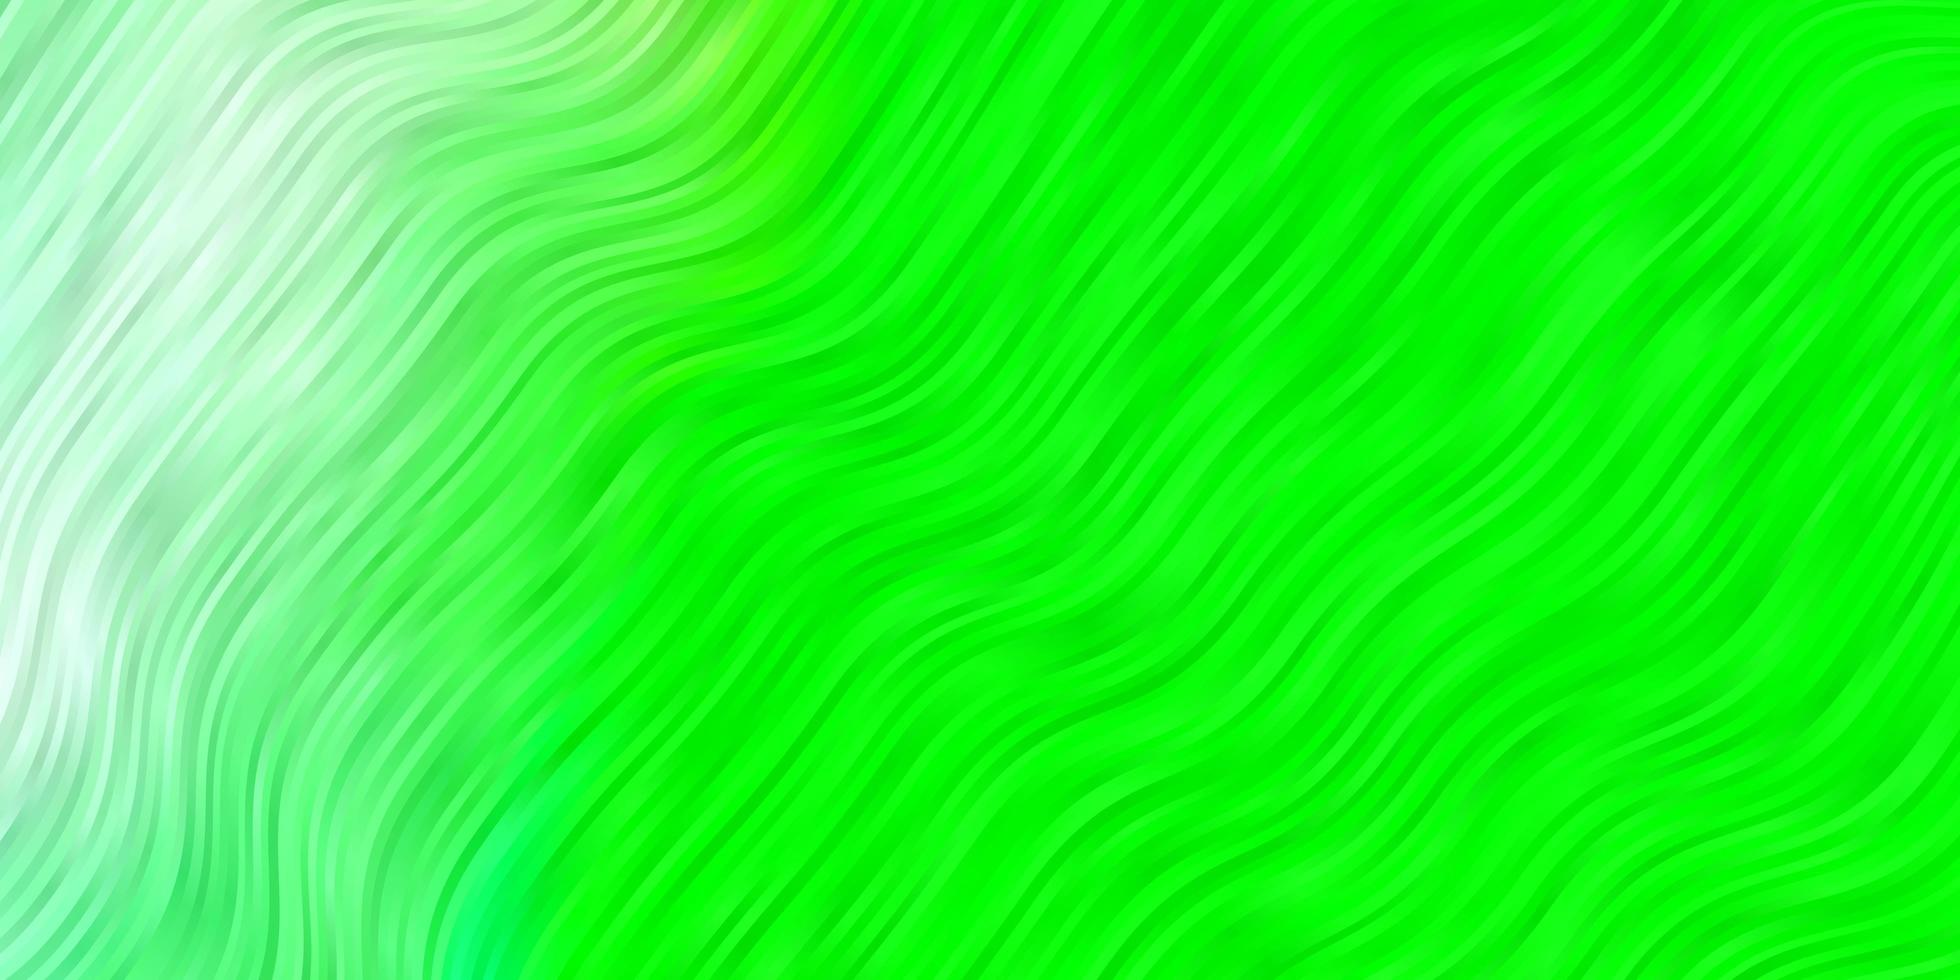 grüne Textur mit Kurven. vektor